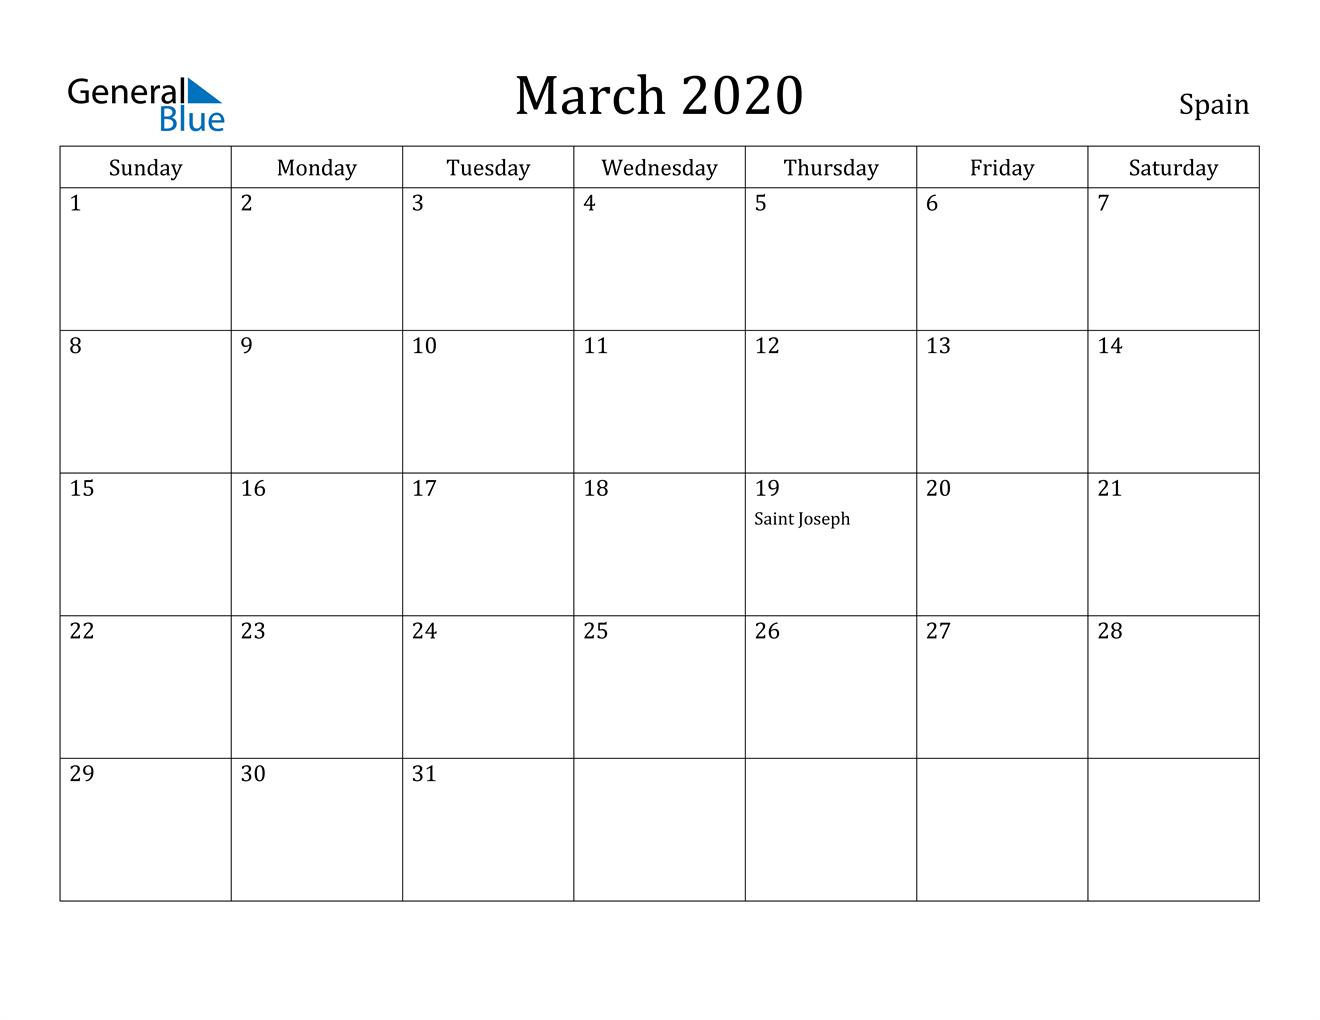 Image of March 2020 Spain Calendar with Holidays Calendar